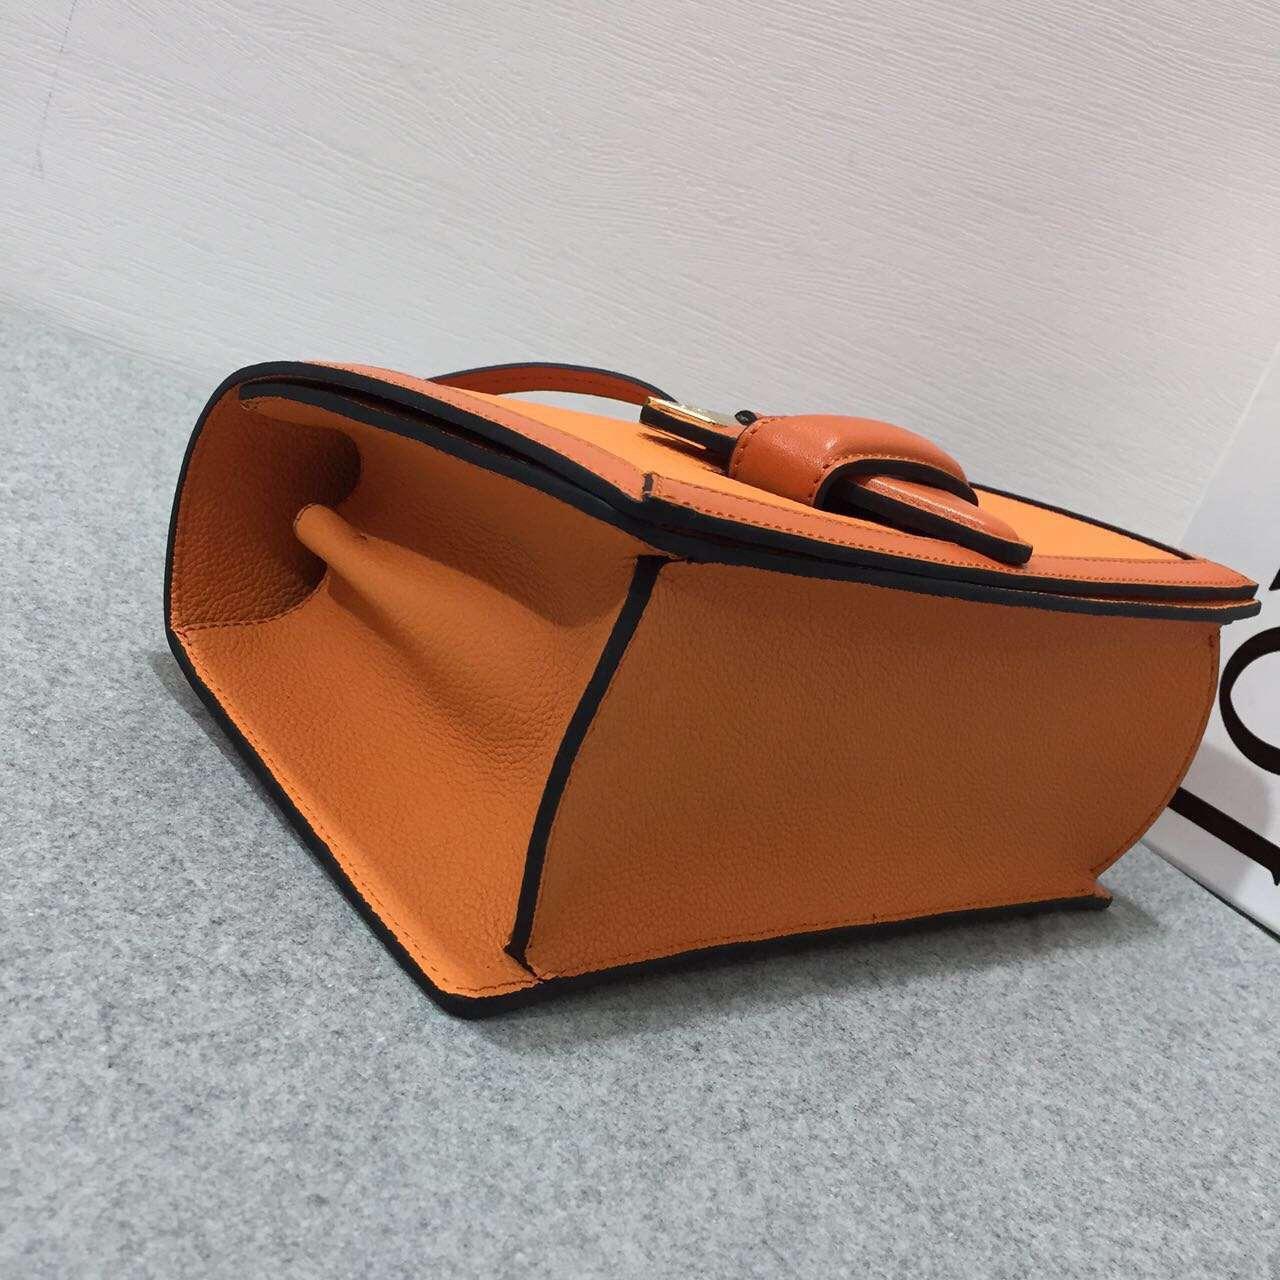 Loewe羅意威 巴塞羅那三角形包 Barcelona Bag 橙色